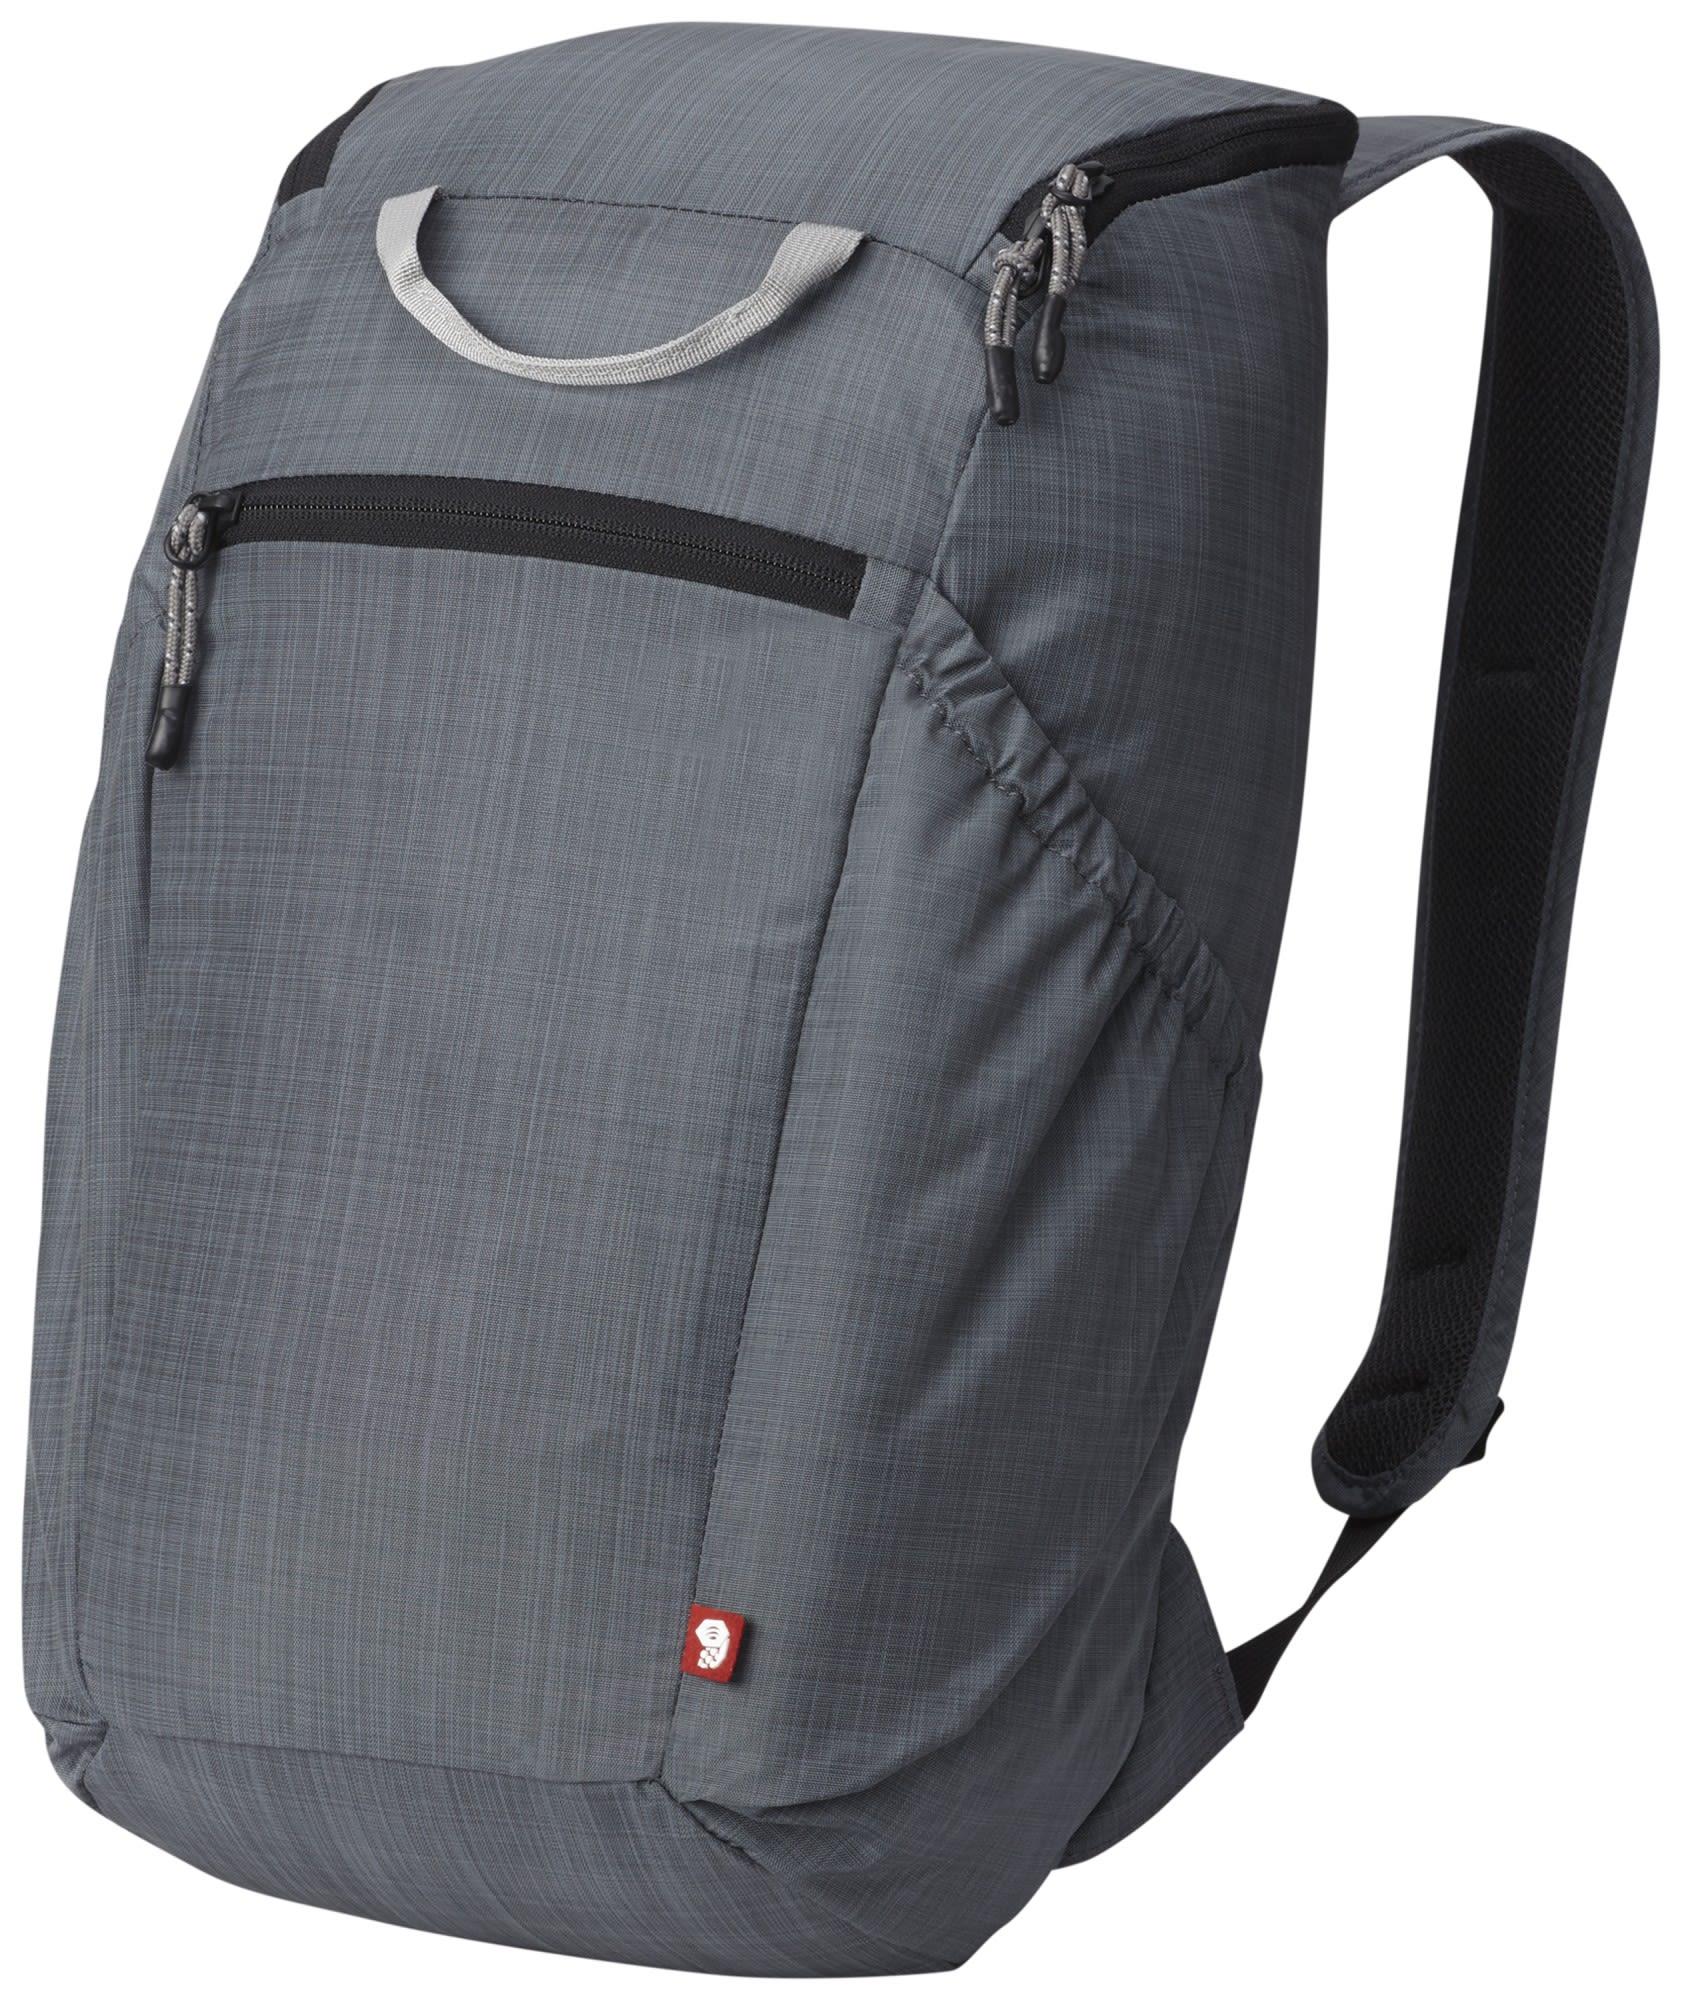 Mountain Hardwear Lightweight 15L Backpack | Größe 16l |  Daypack